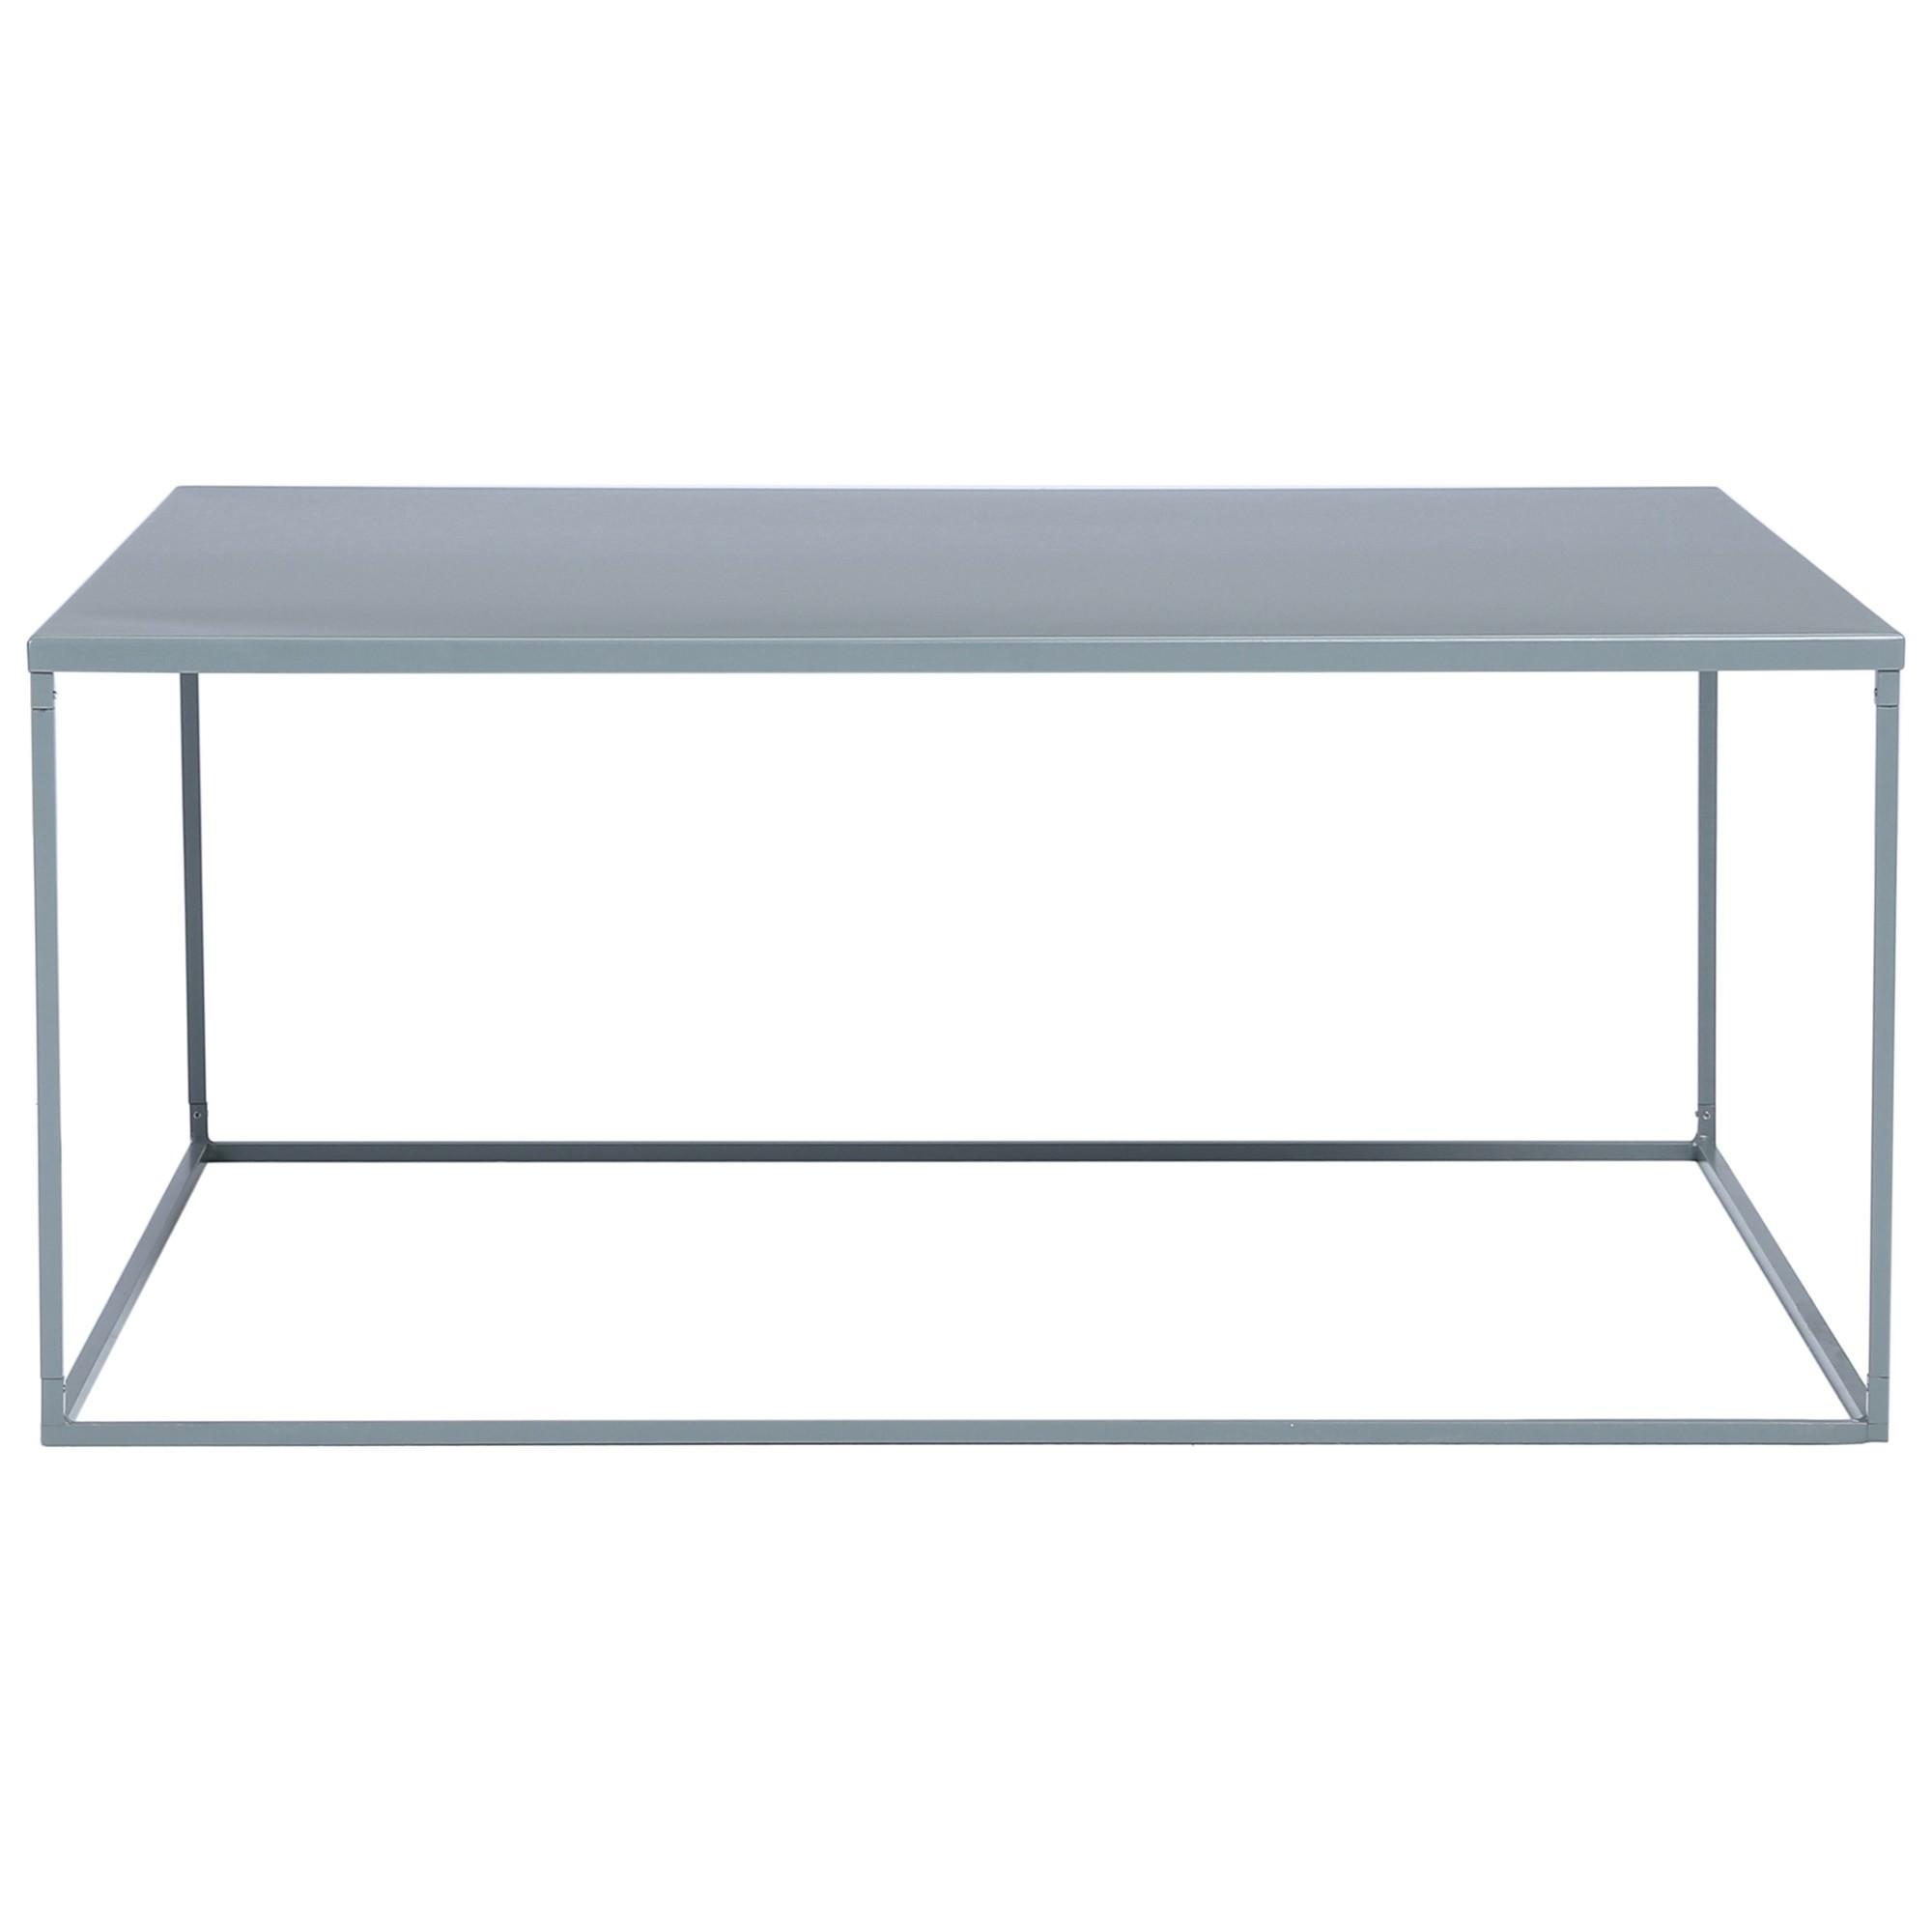 Darnell Metal Square Coffee Table, 80cm, Grey